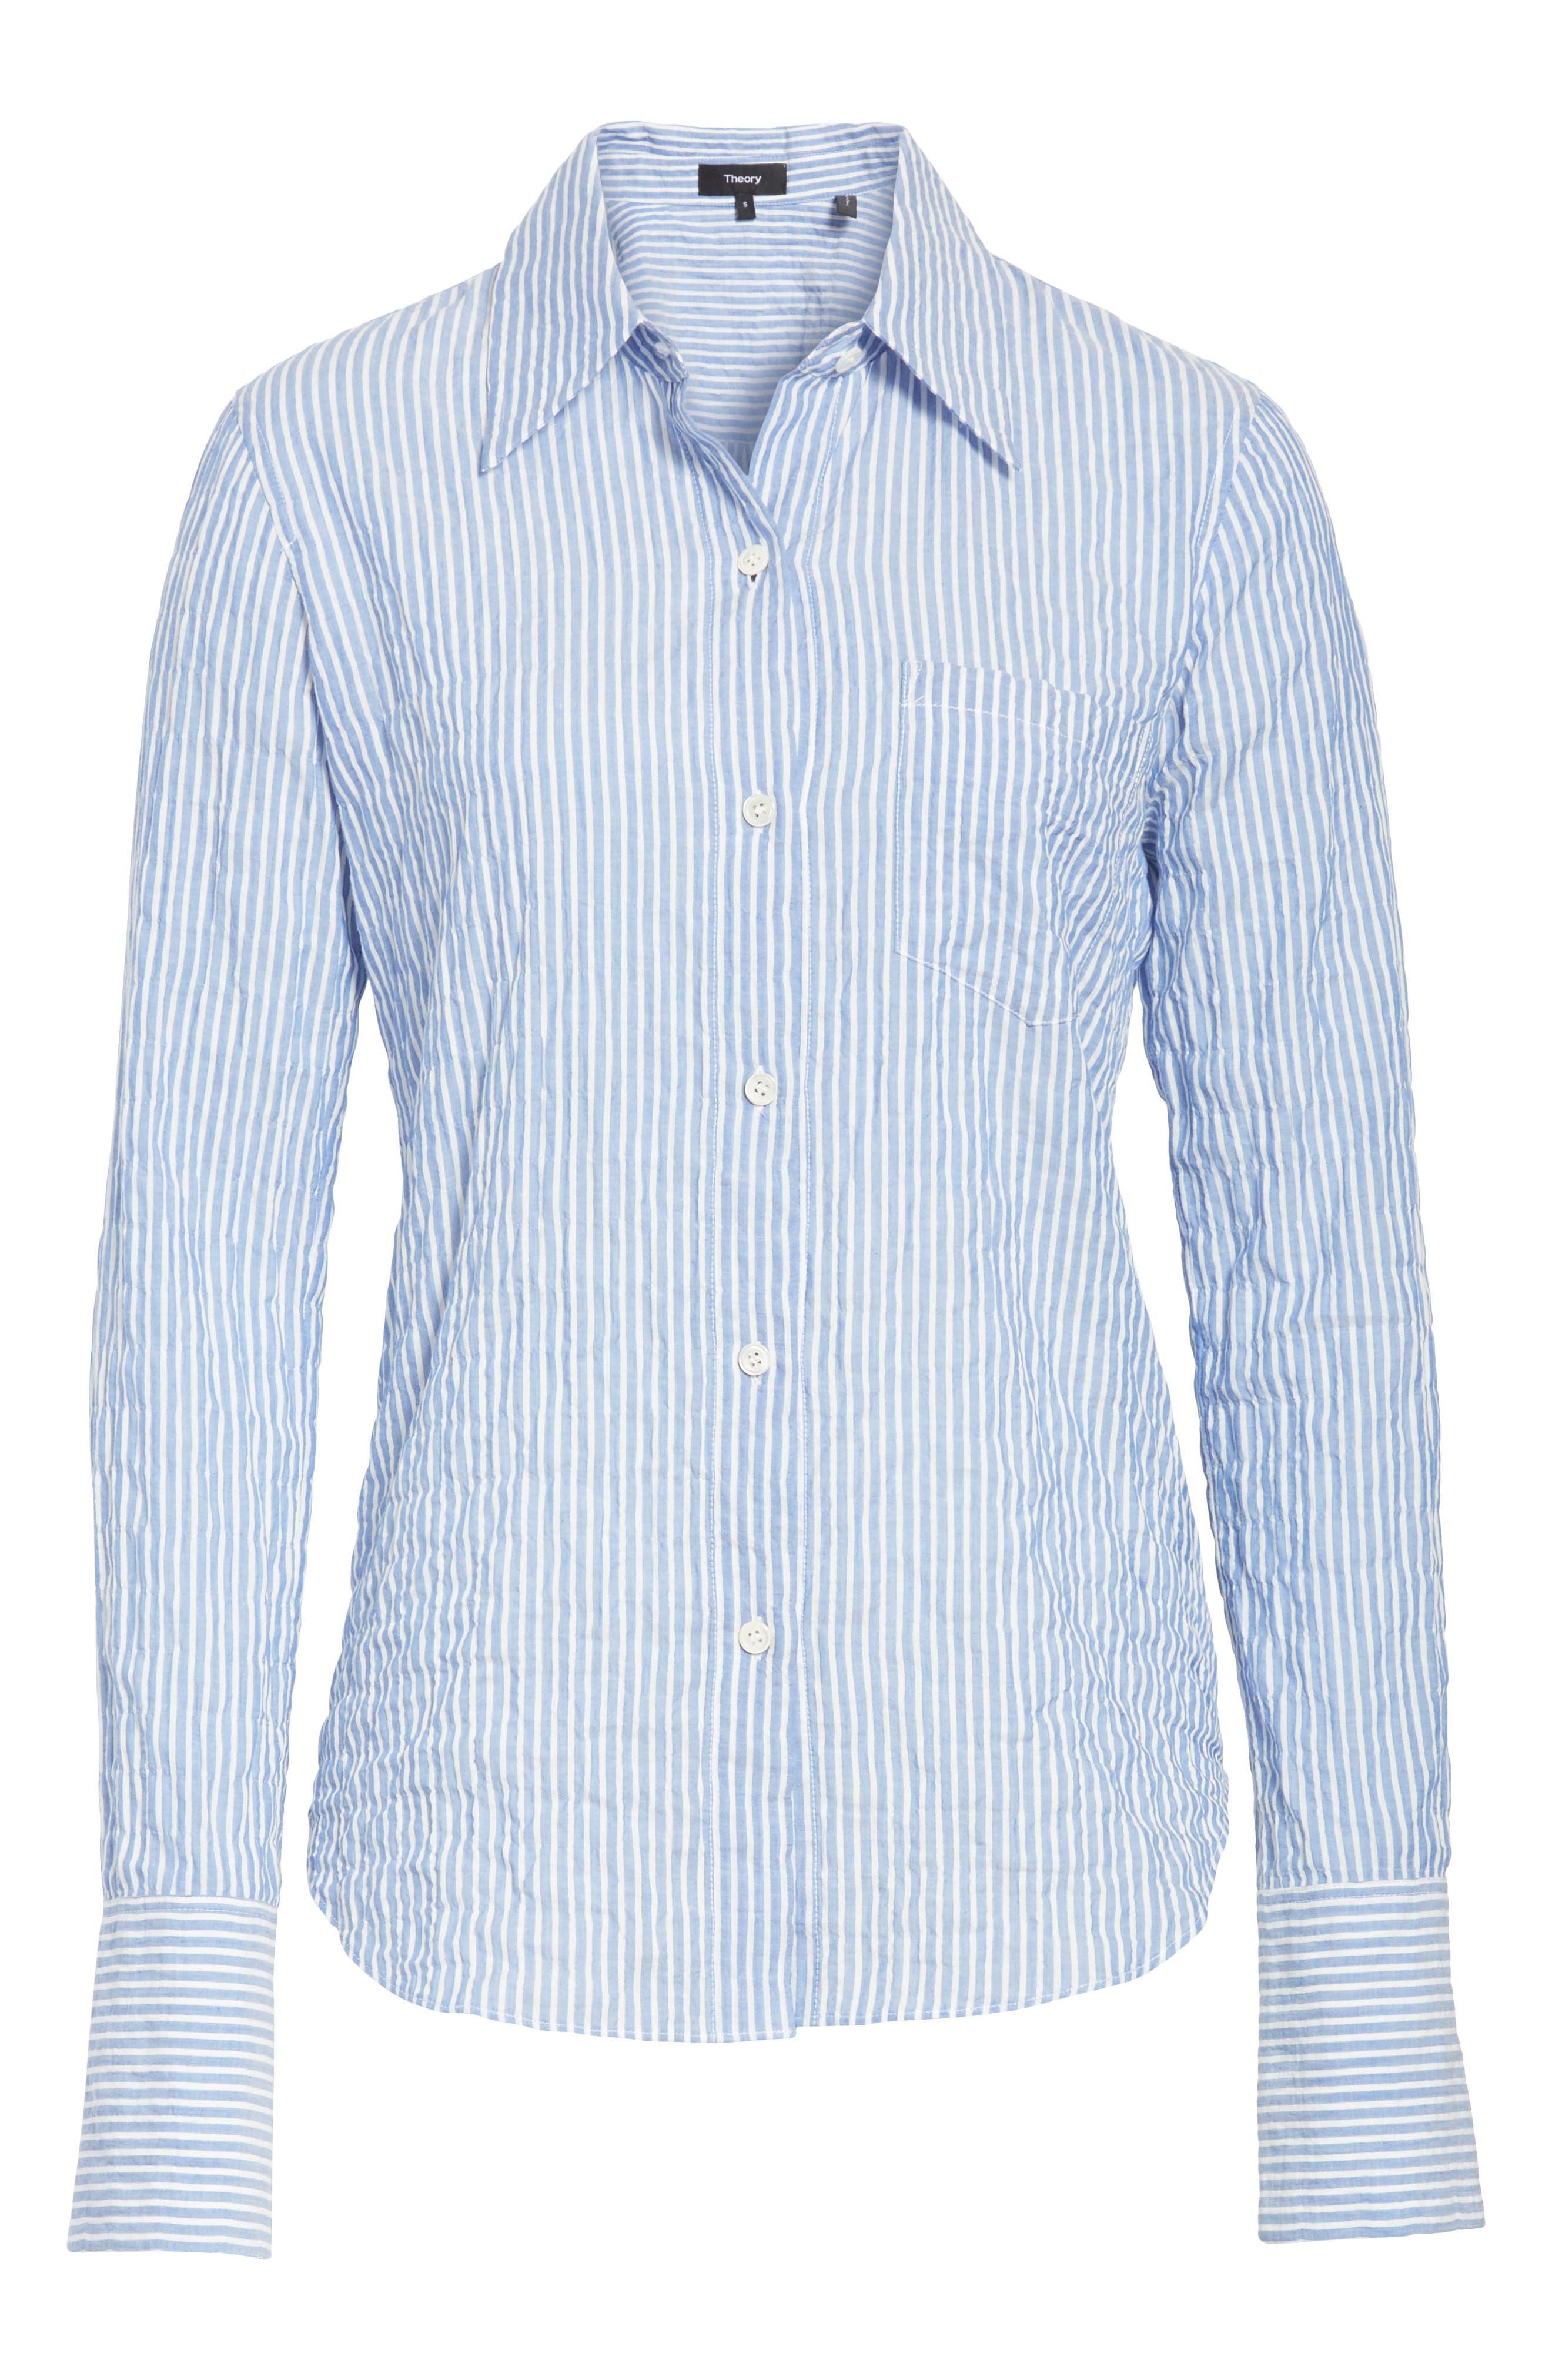 Classic Button Down Shirt,                             Alternate thumbnail 6, color,                             Blue/ White